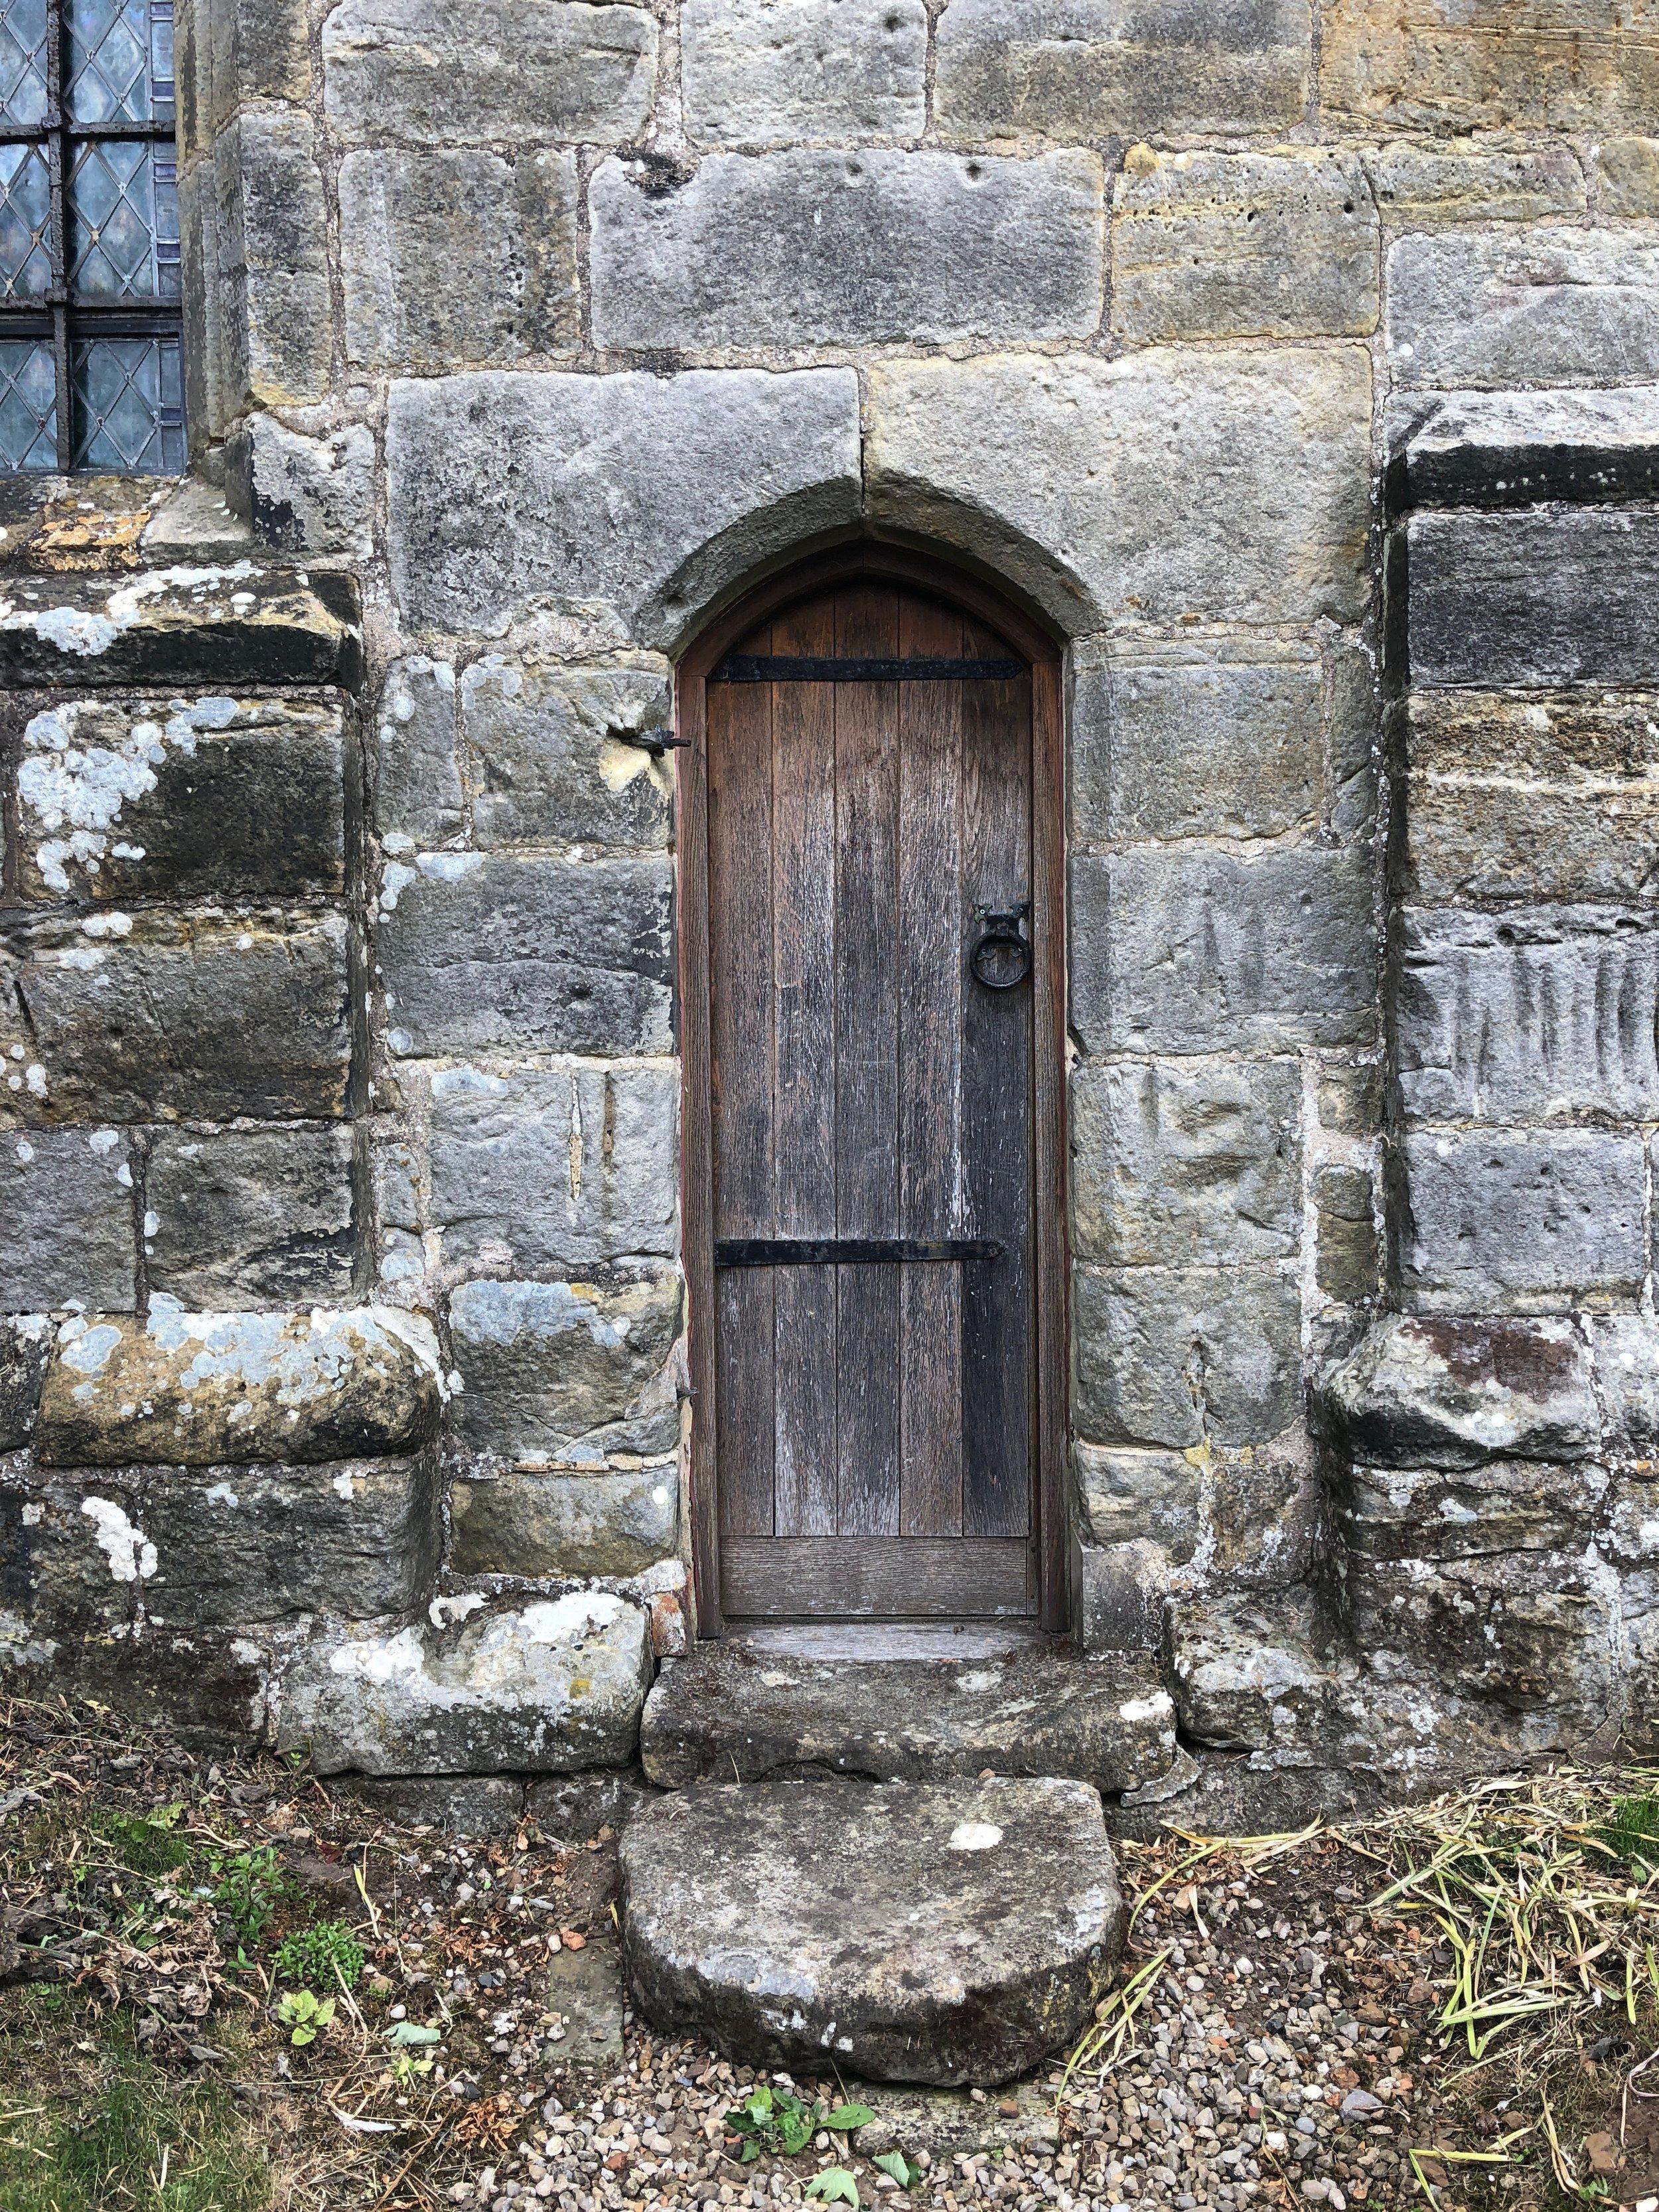 St. Cuthbert's Church, Crayke, Yorkshire, UK